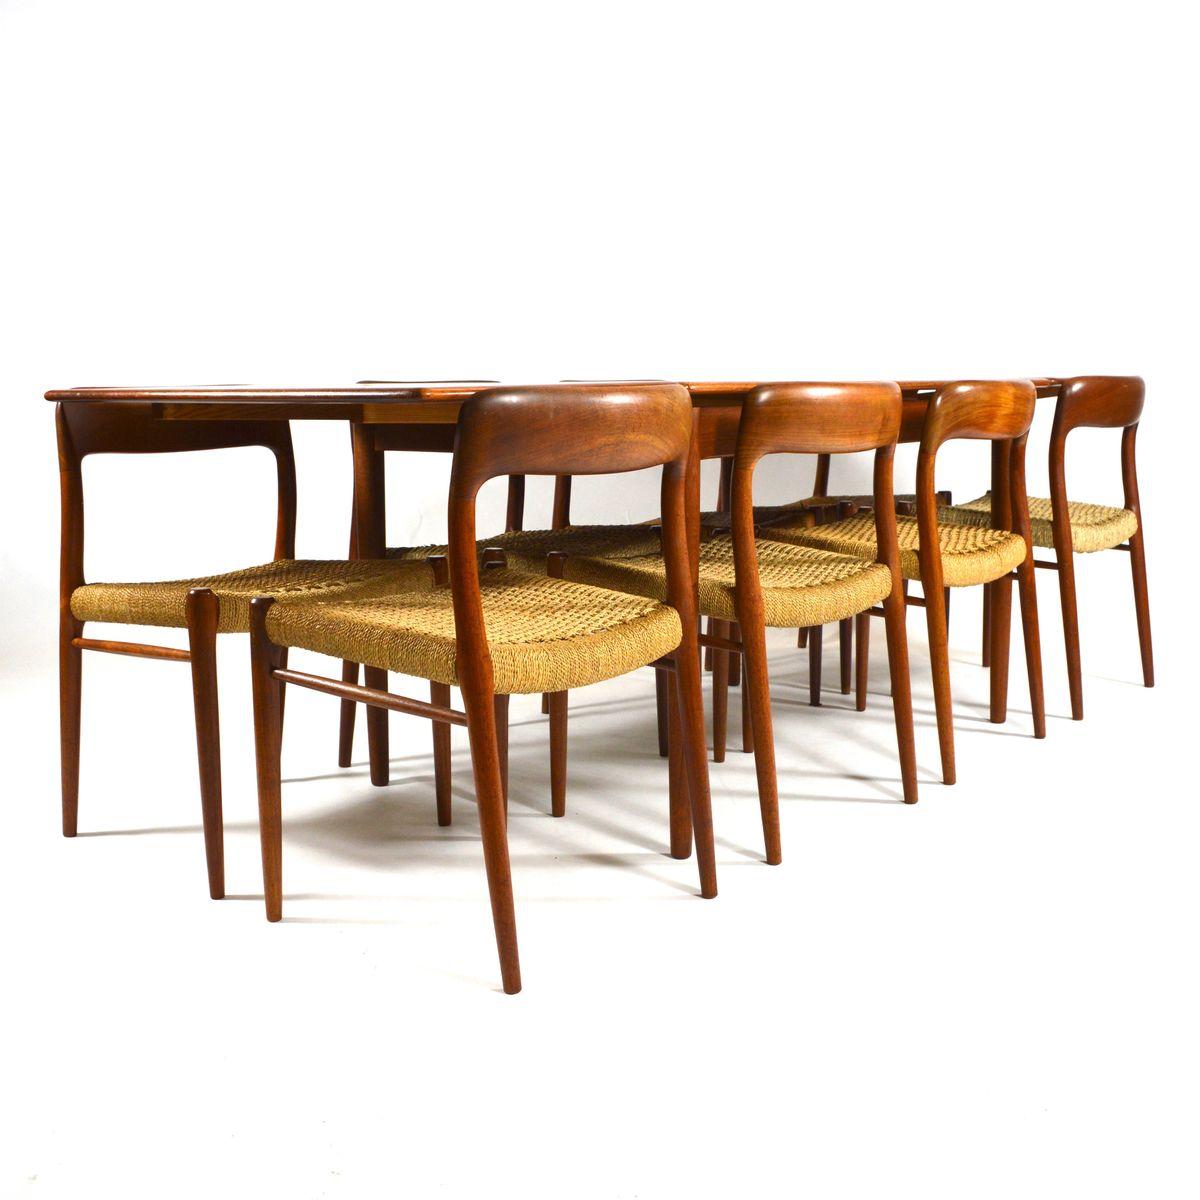 Teak Dining Room Set: Mid-Century Danish Teak Dining Set By Niels O. Møller For